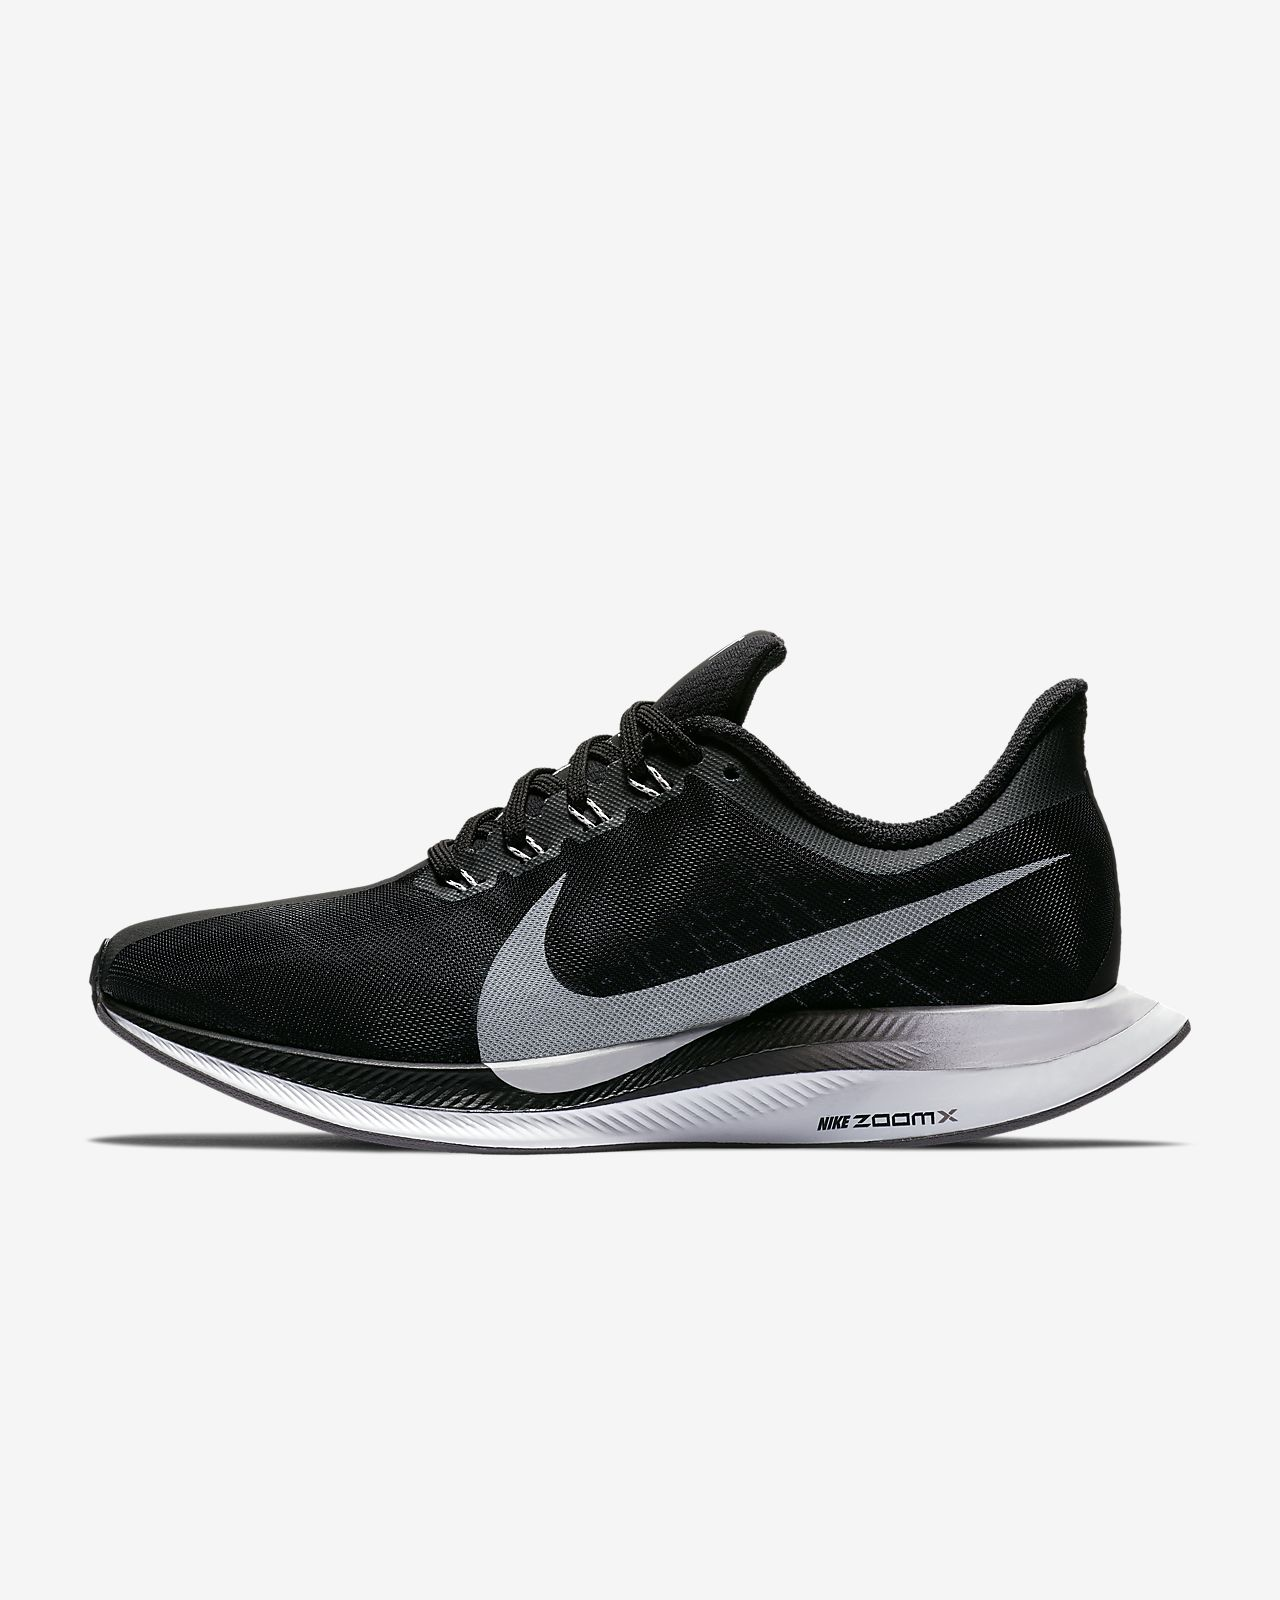 the latest 0d868 1b1e3 ... Löparsko Nike Zoom Pegasus Turbo för kvinnor